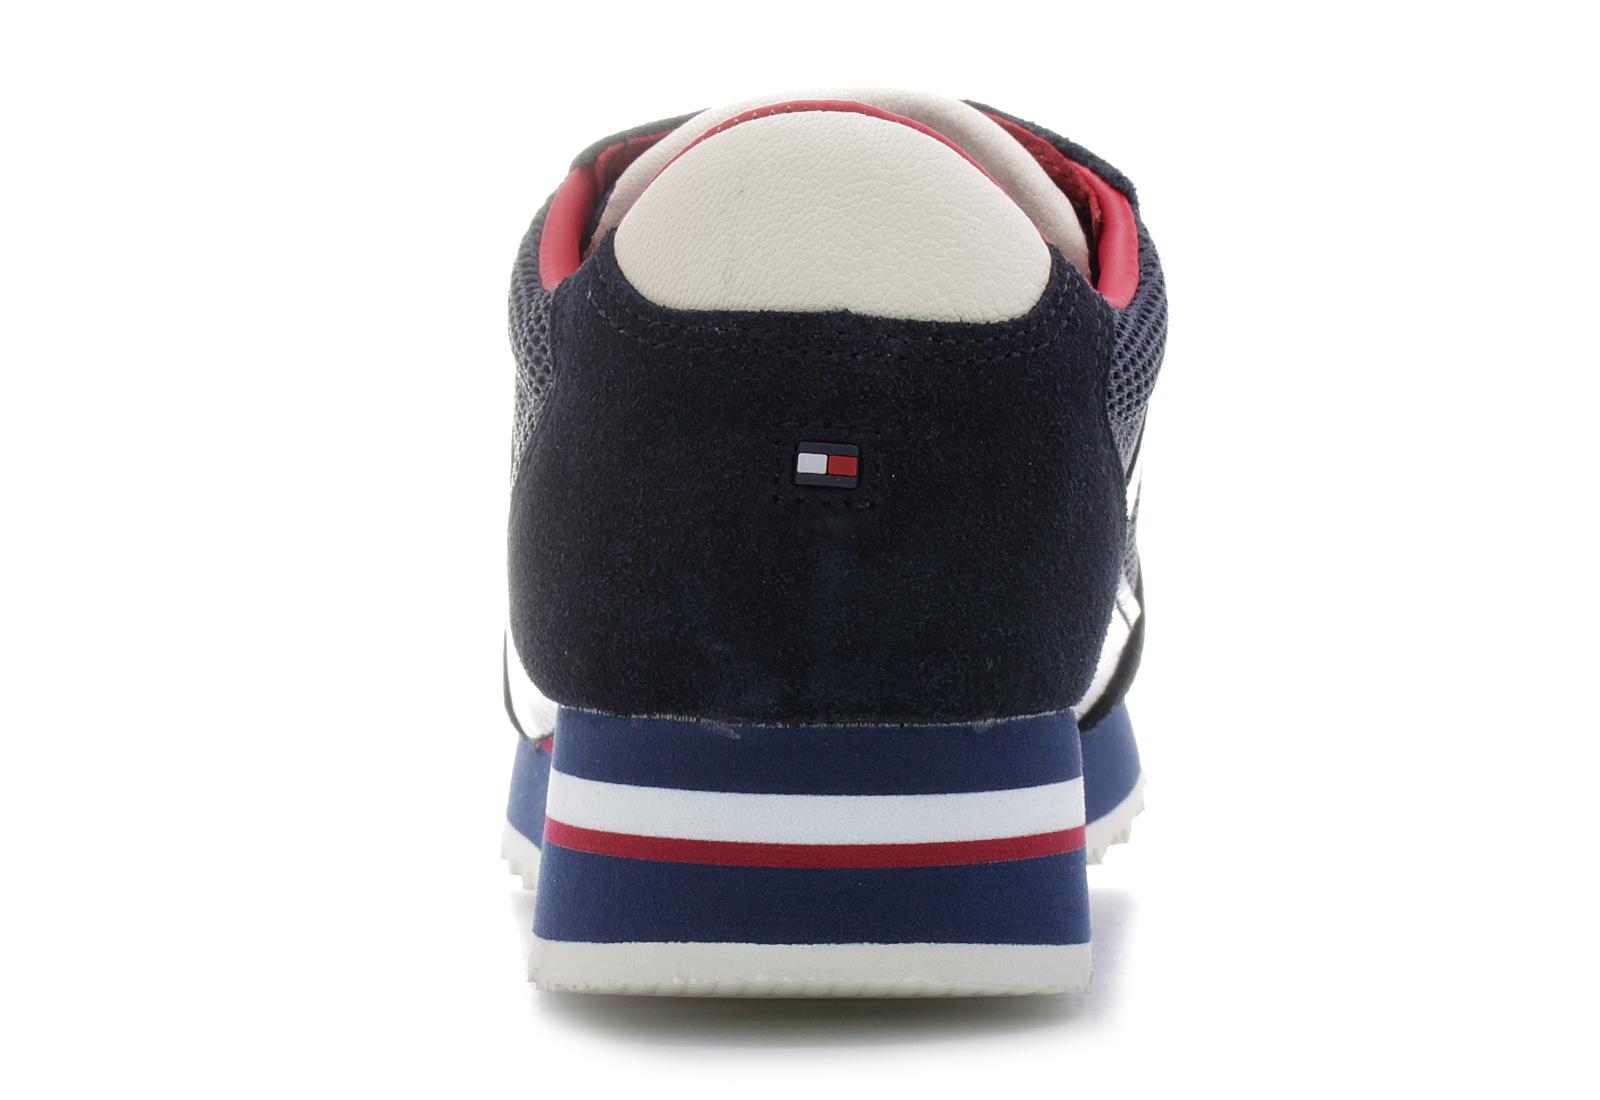 342a25b0a6539 Tommy Hilfiger Shoes - Angel 1c1 - 17S-0627-406 - Online shop for ...